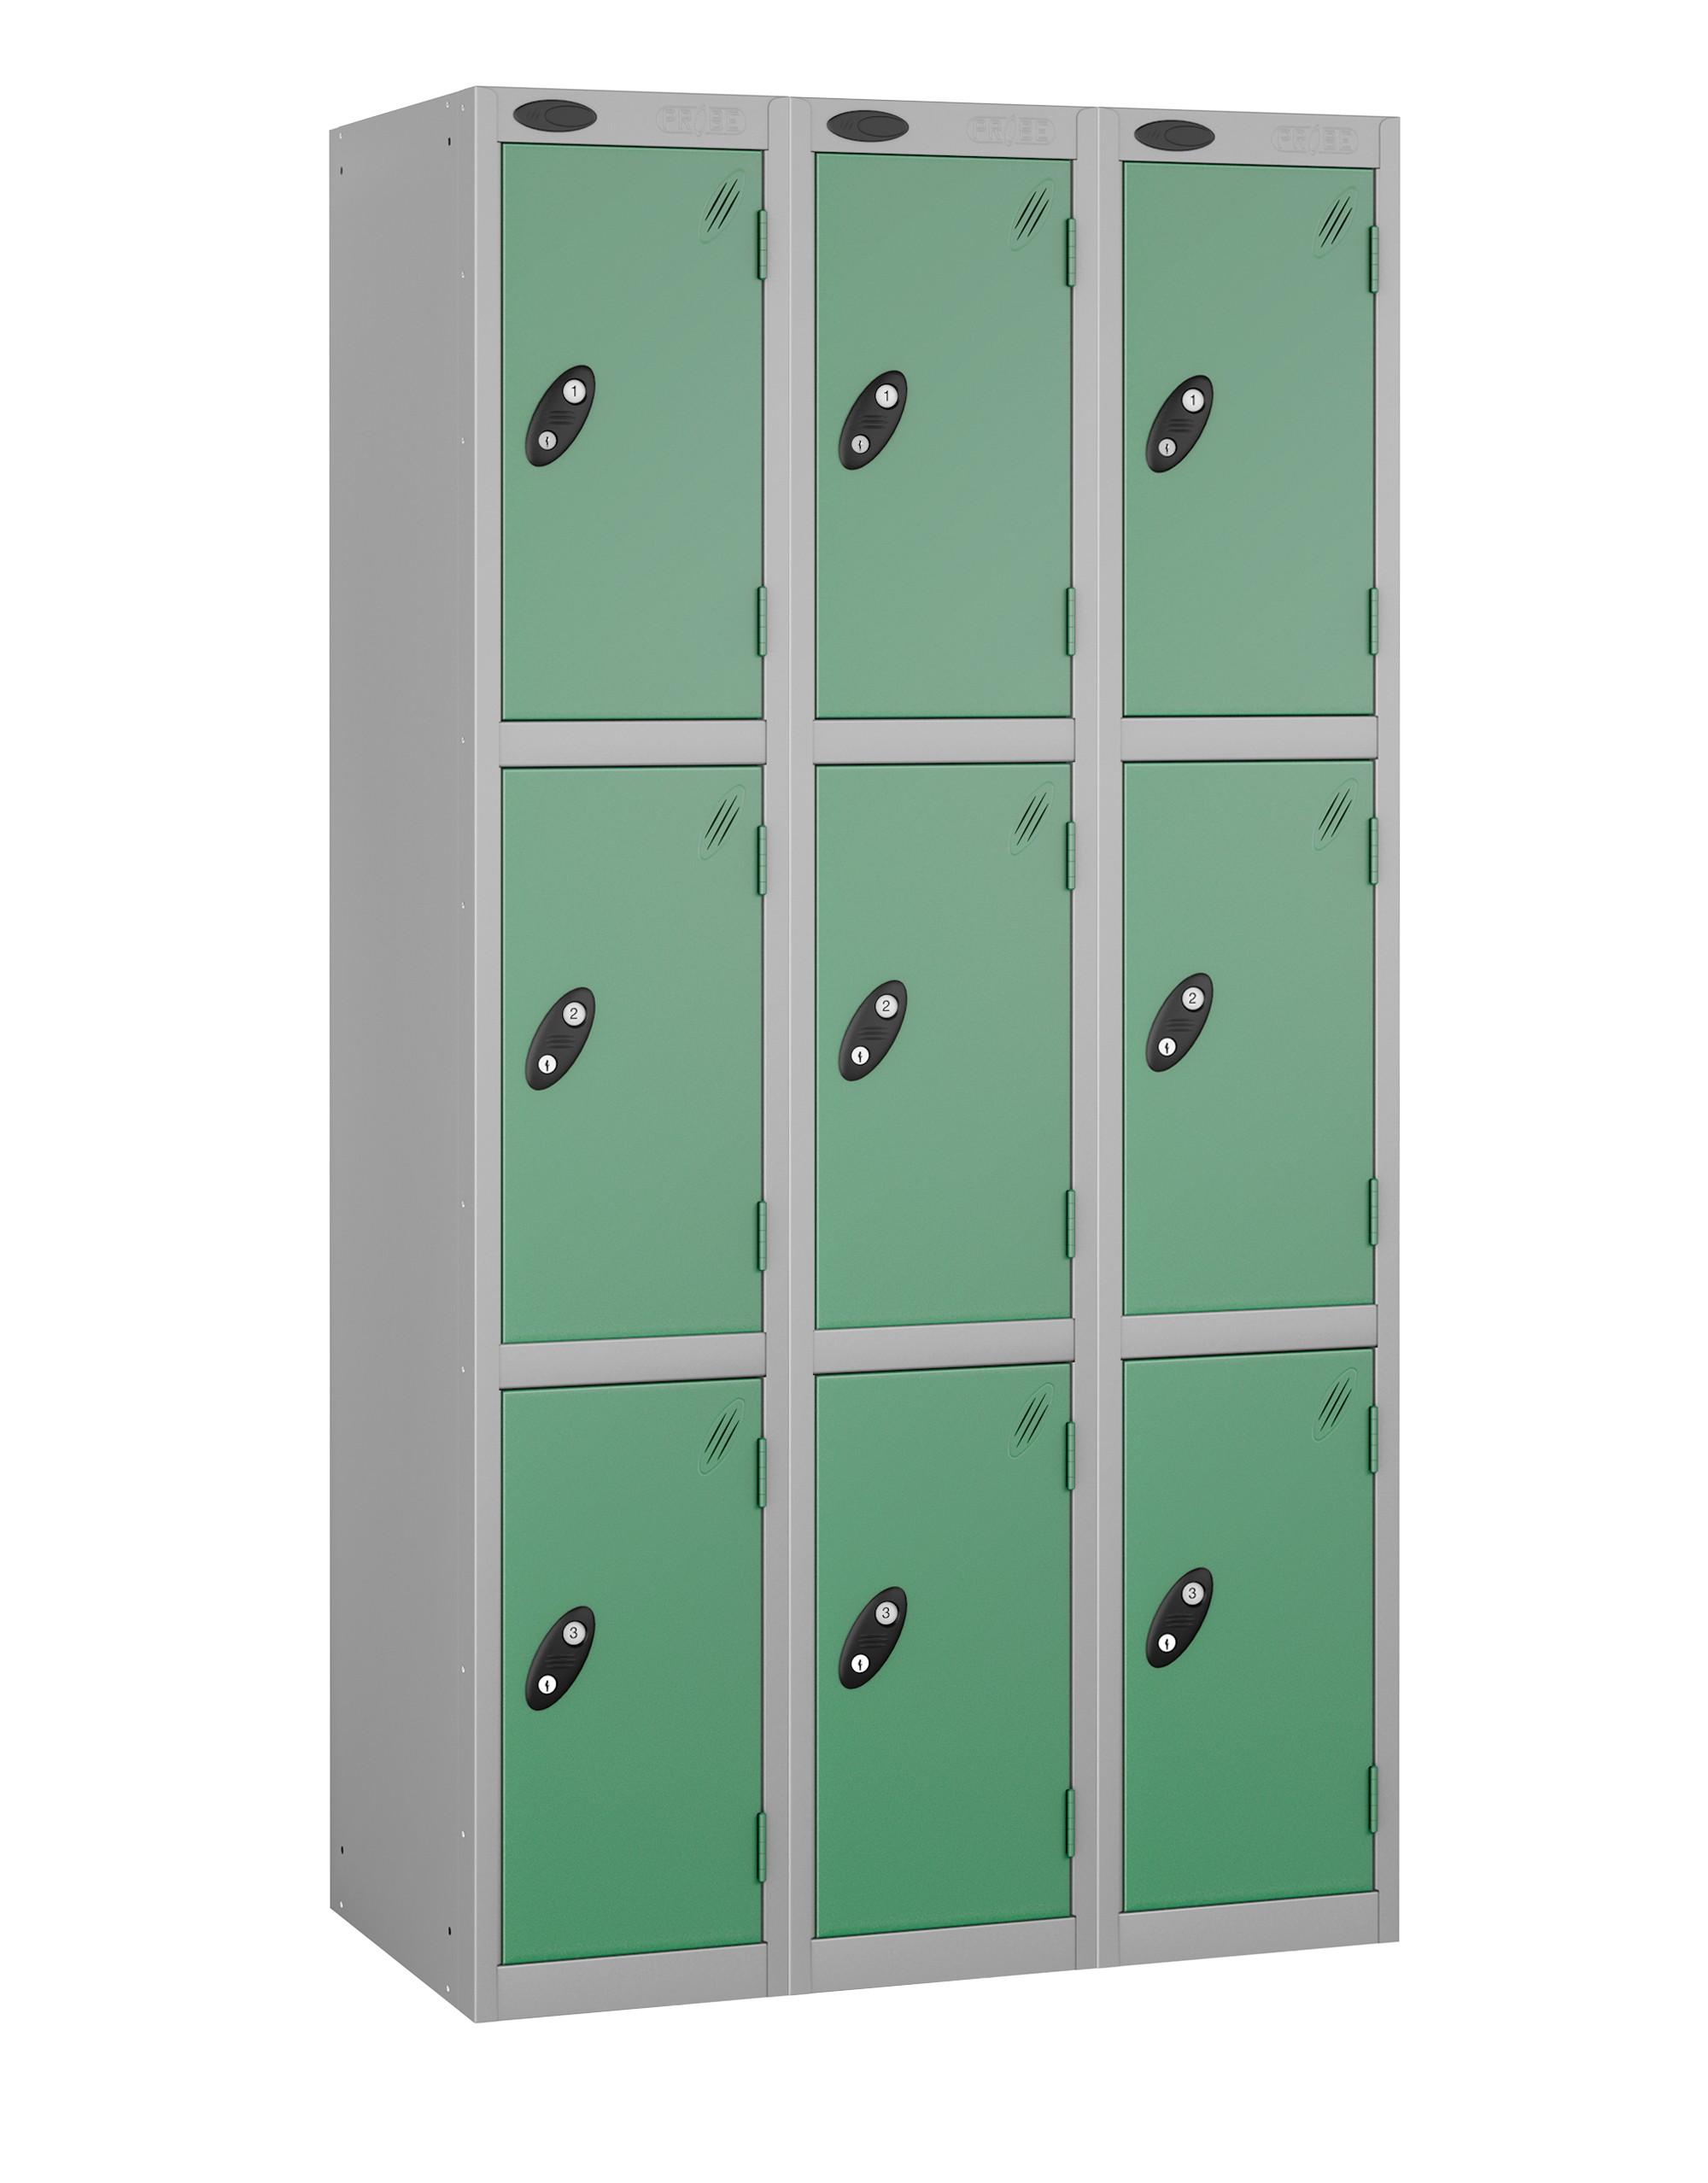 Colour Range Three Doors Locker - Nest of 3